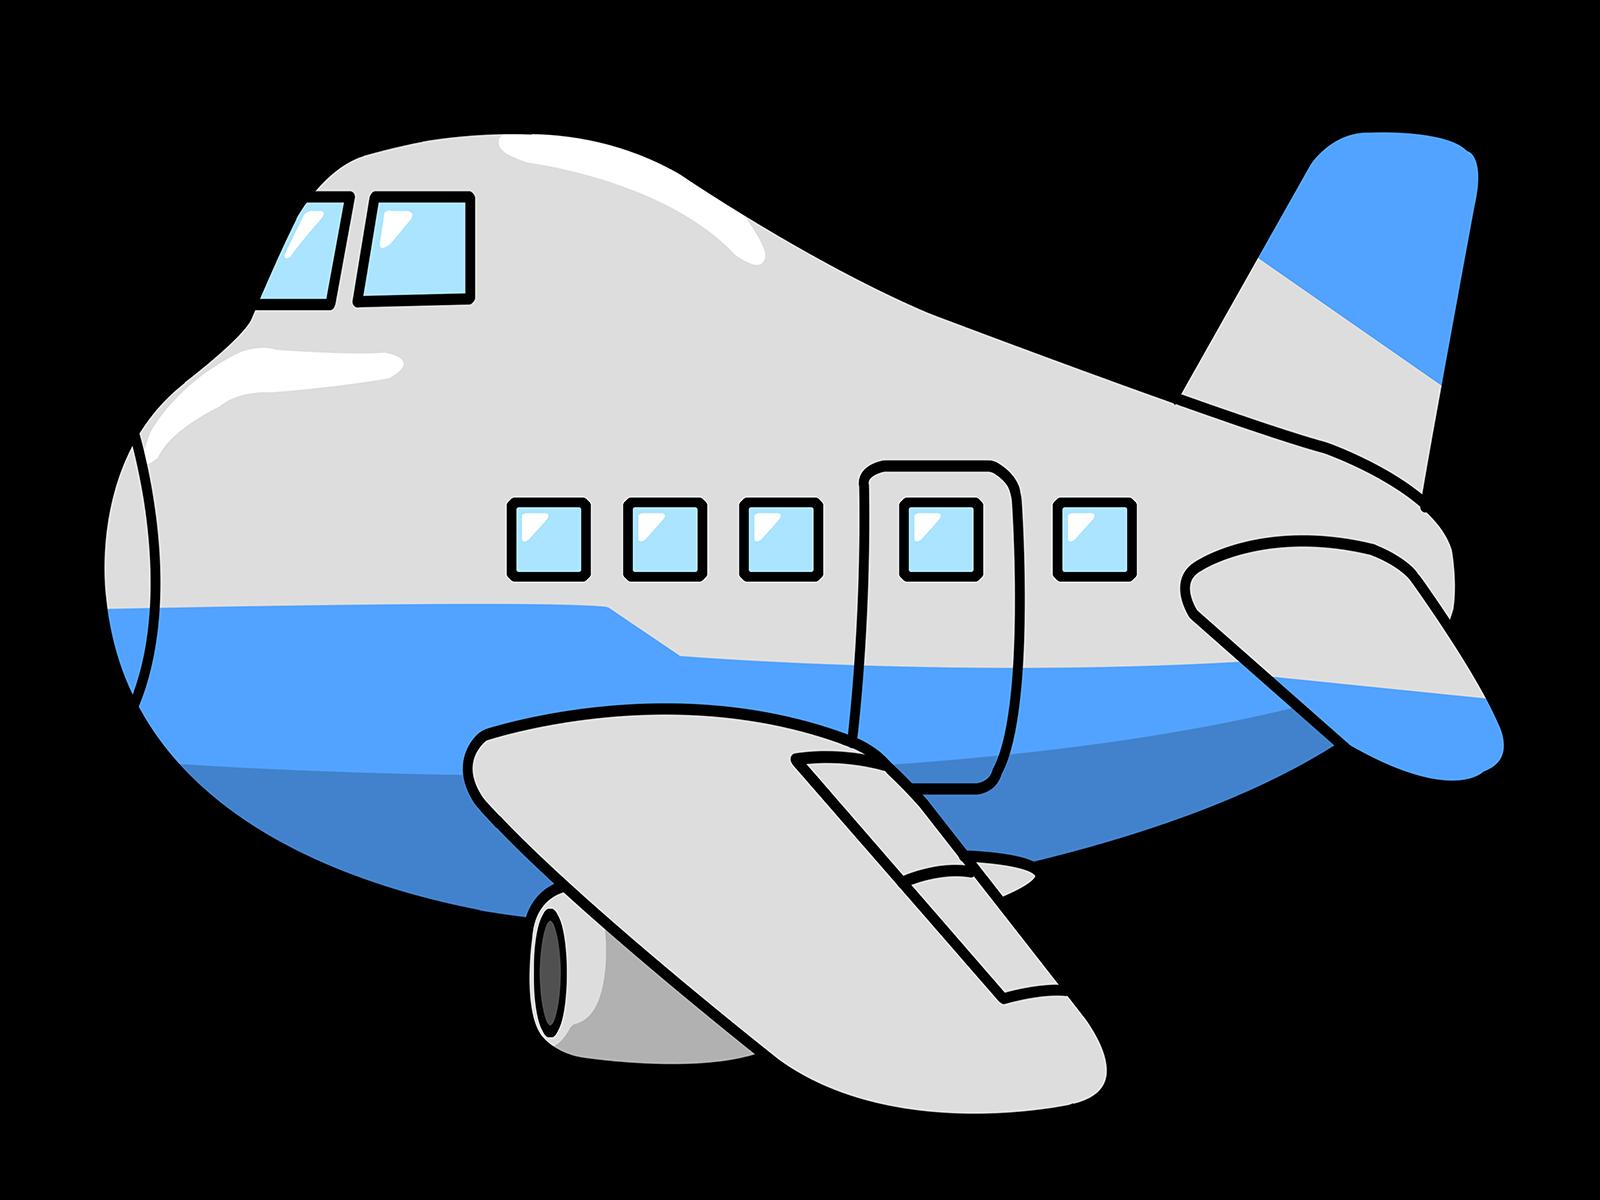 Preschool clipart airplane, Preschool airplane Transparent.